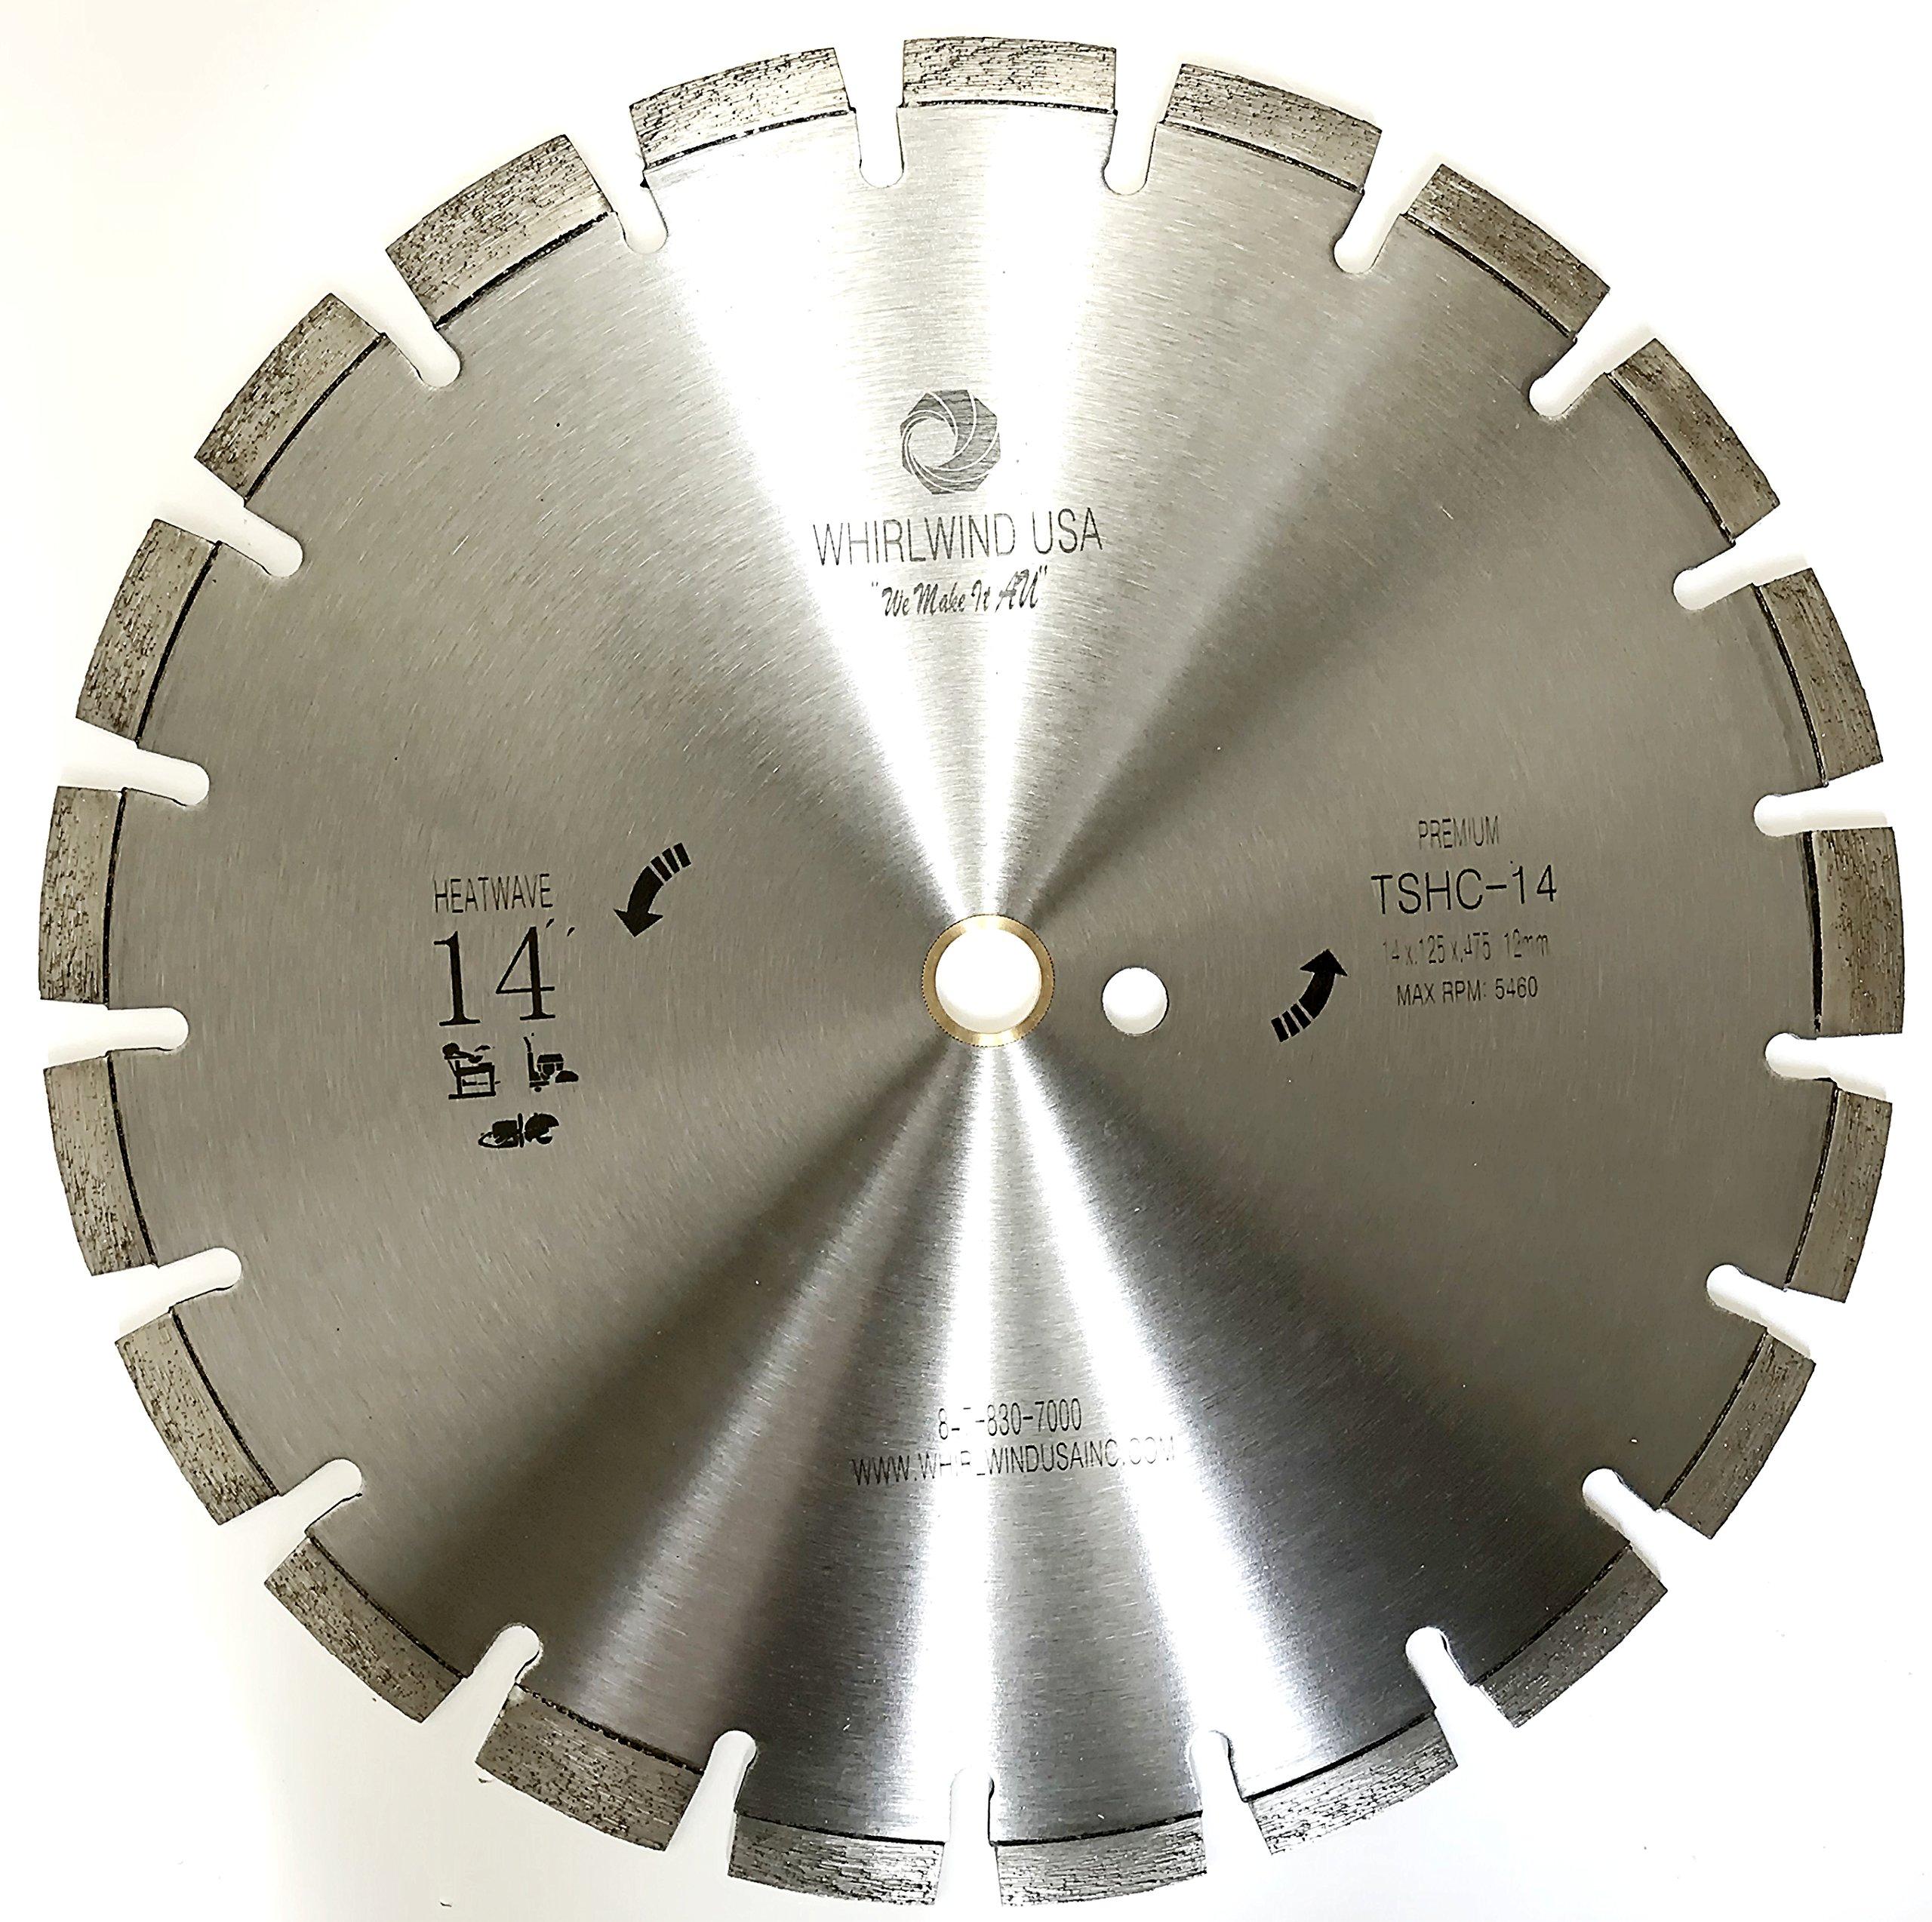 Whirlwind USA 14 inch Heatwave Dry Concrete Cutting Laser Welded Segmented Diamond Saw Blades (14'')